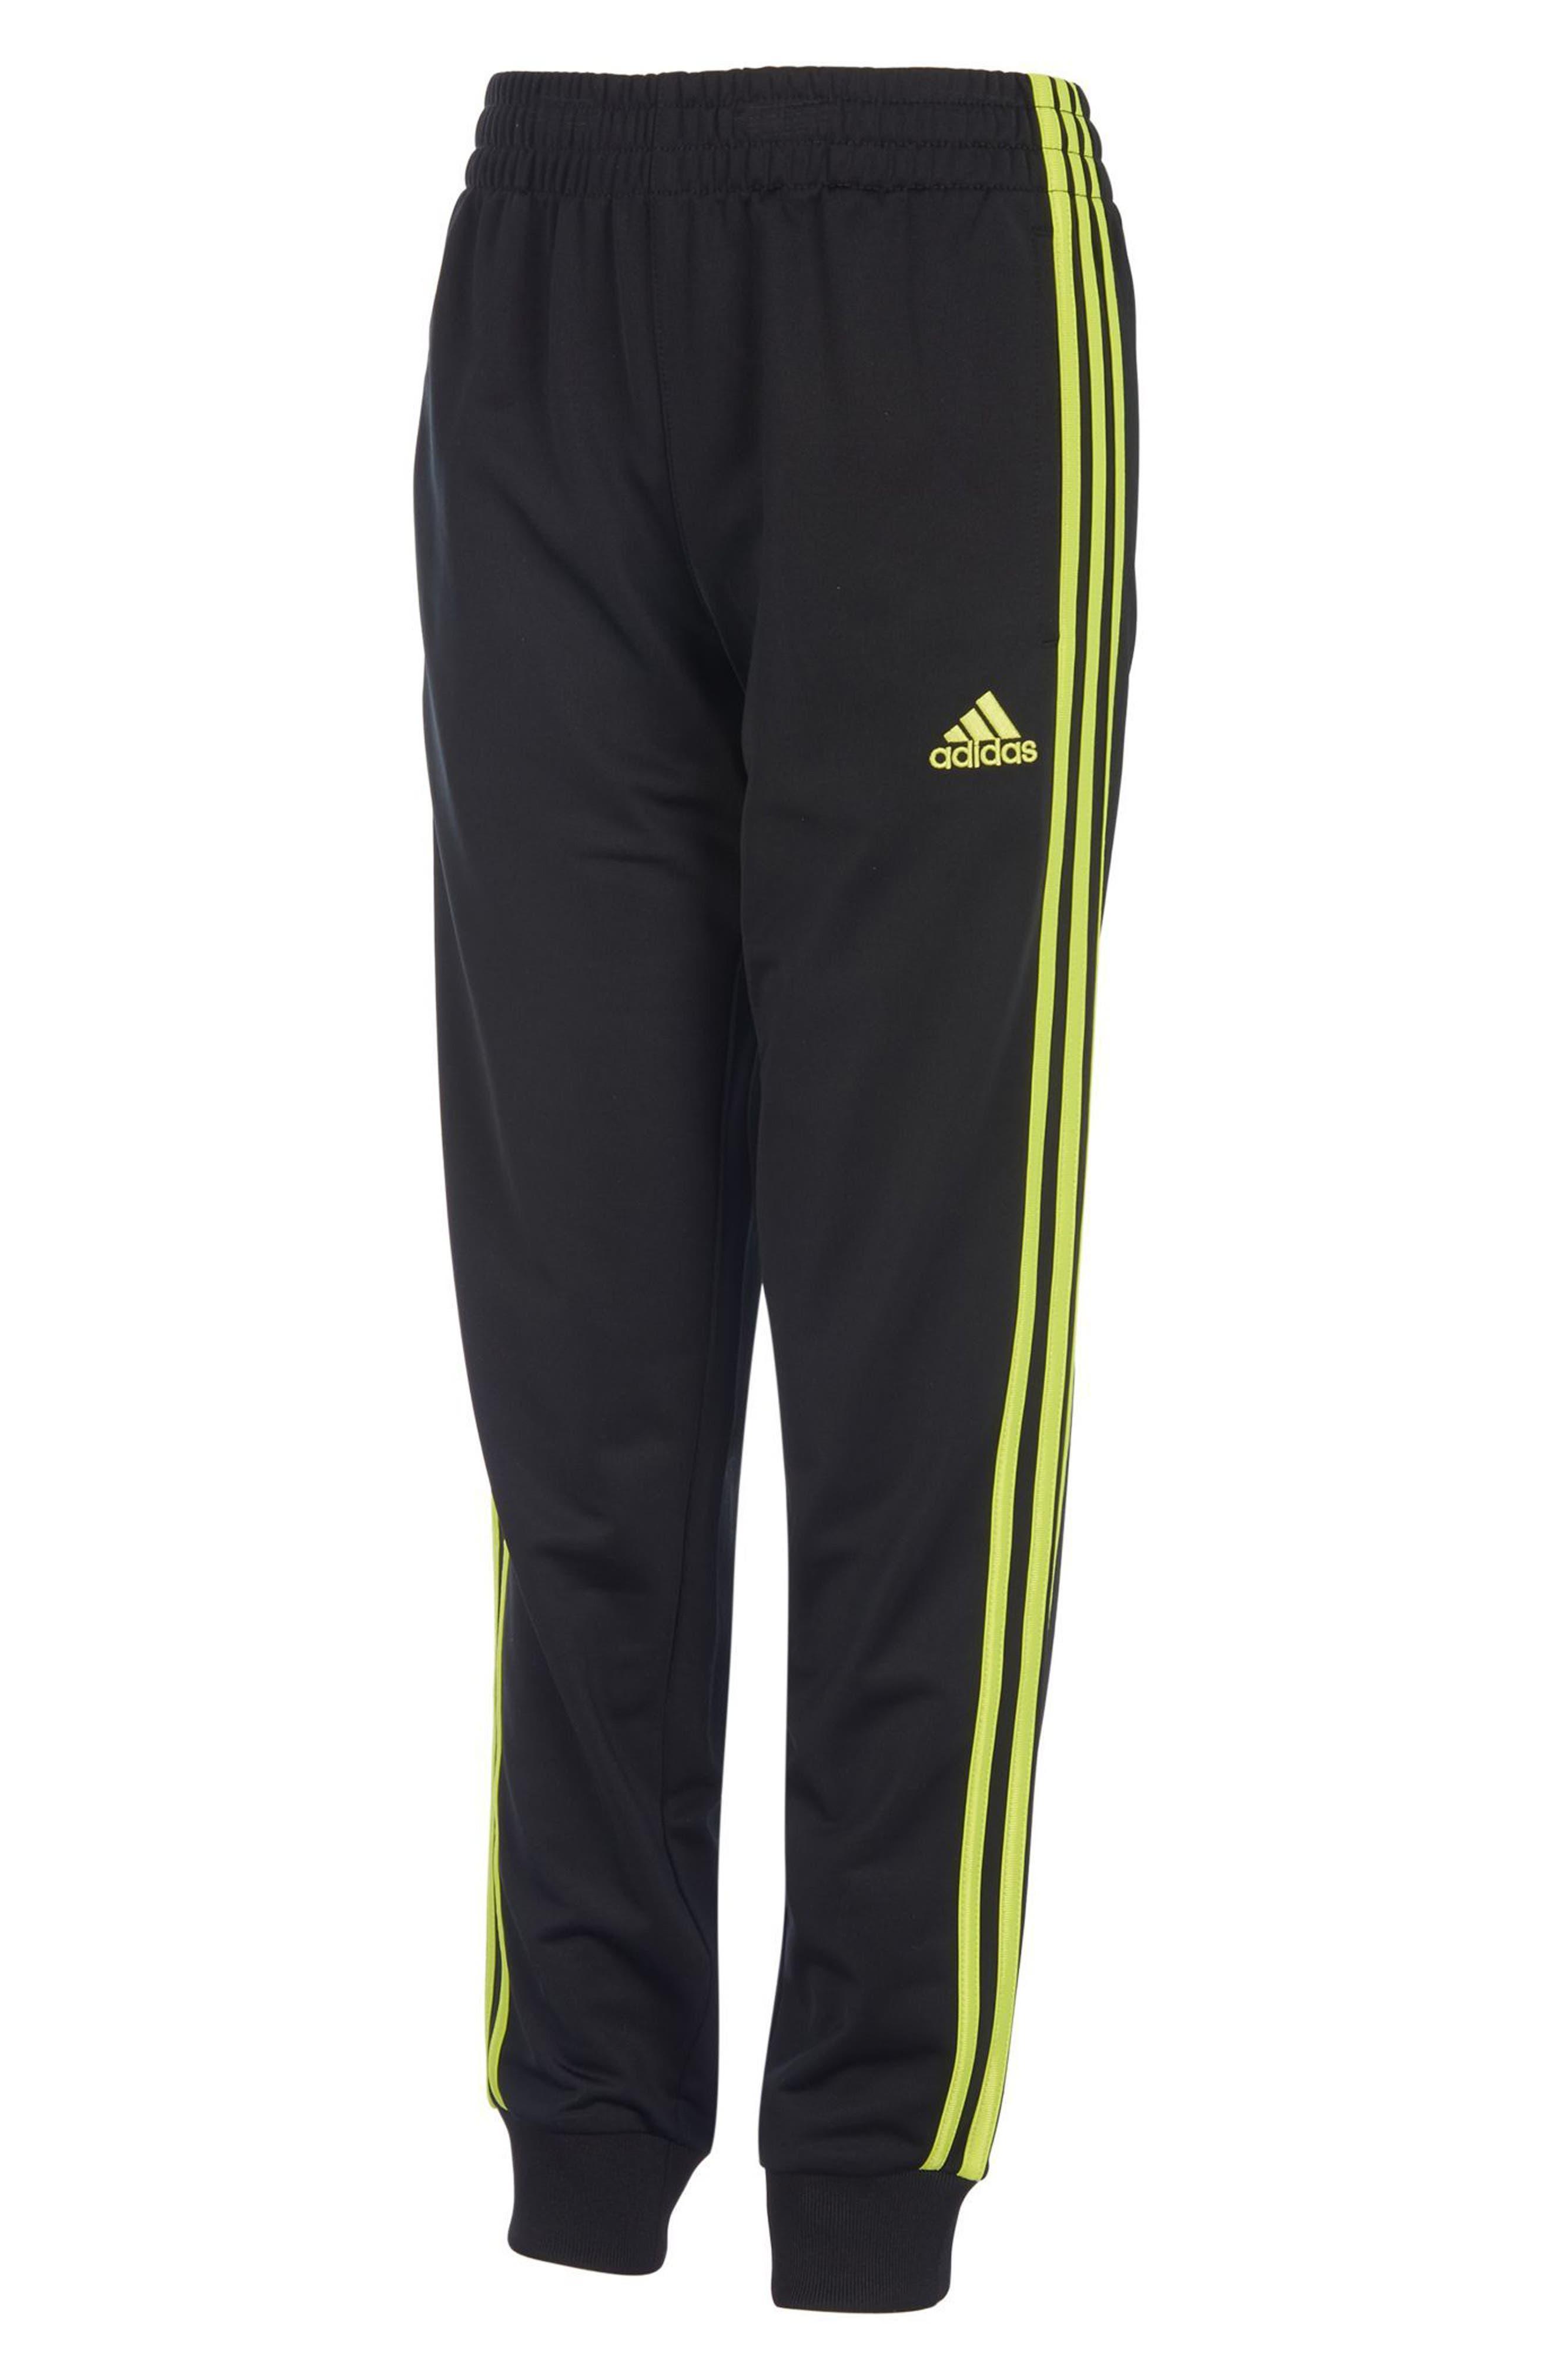 Iconic Jogger Pants,                             Main thumbnail 1, color,                             Black/ Yellow